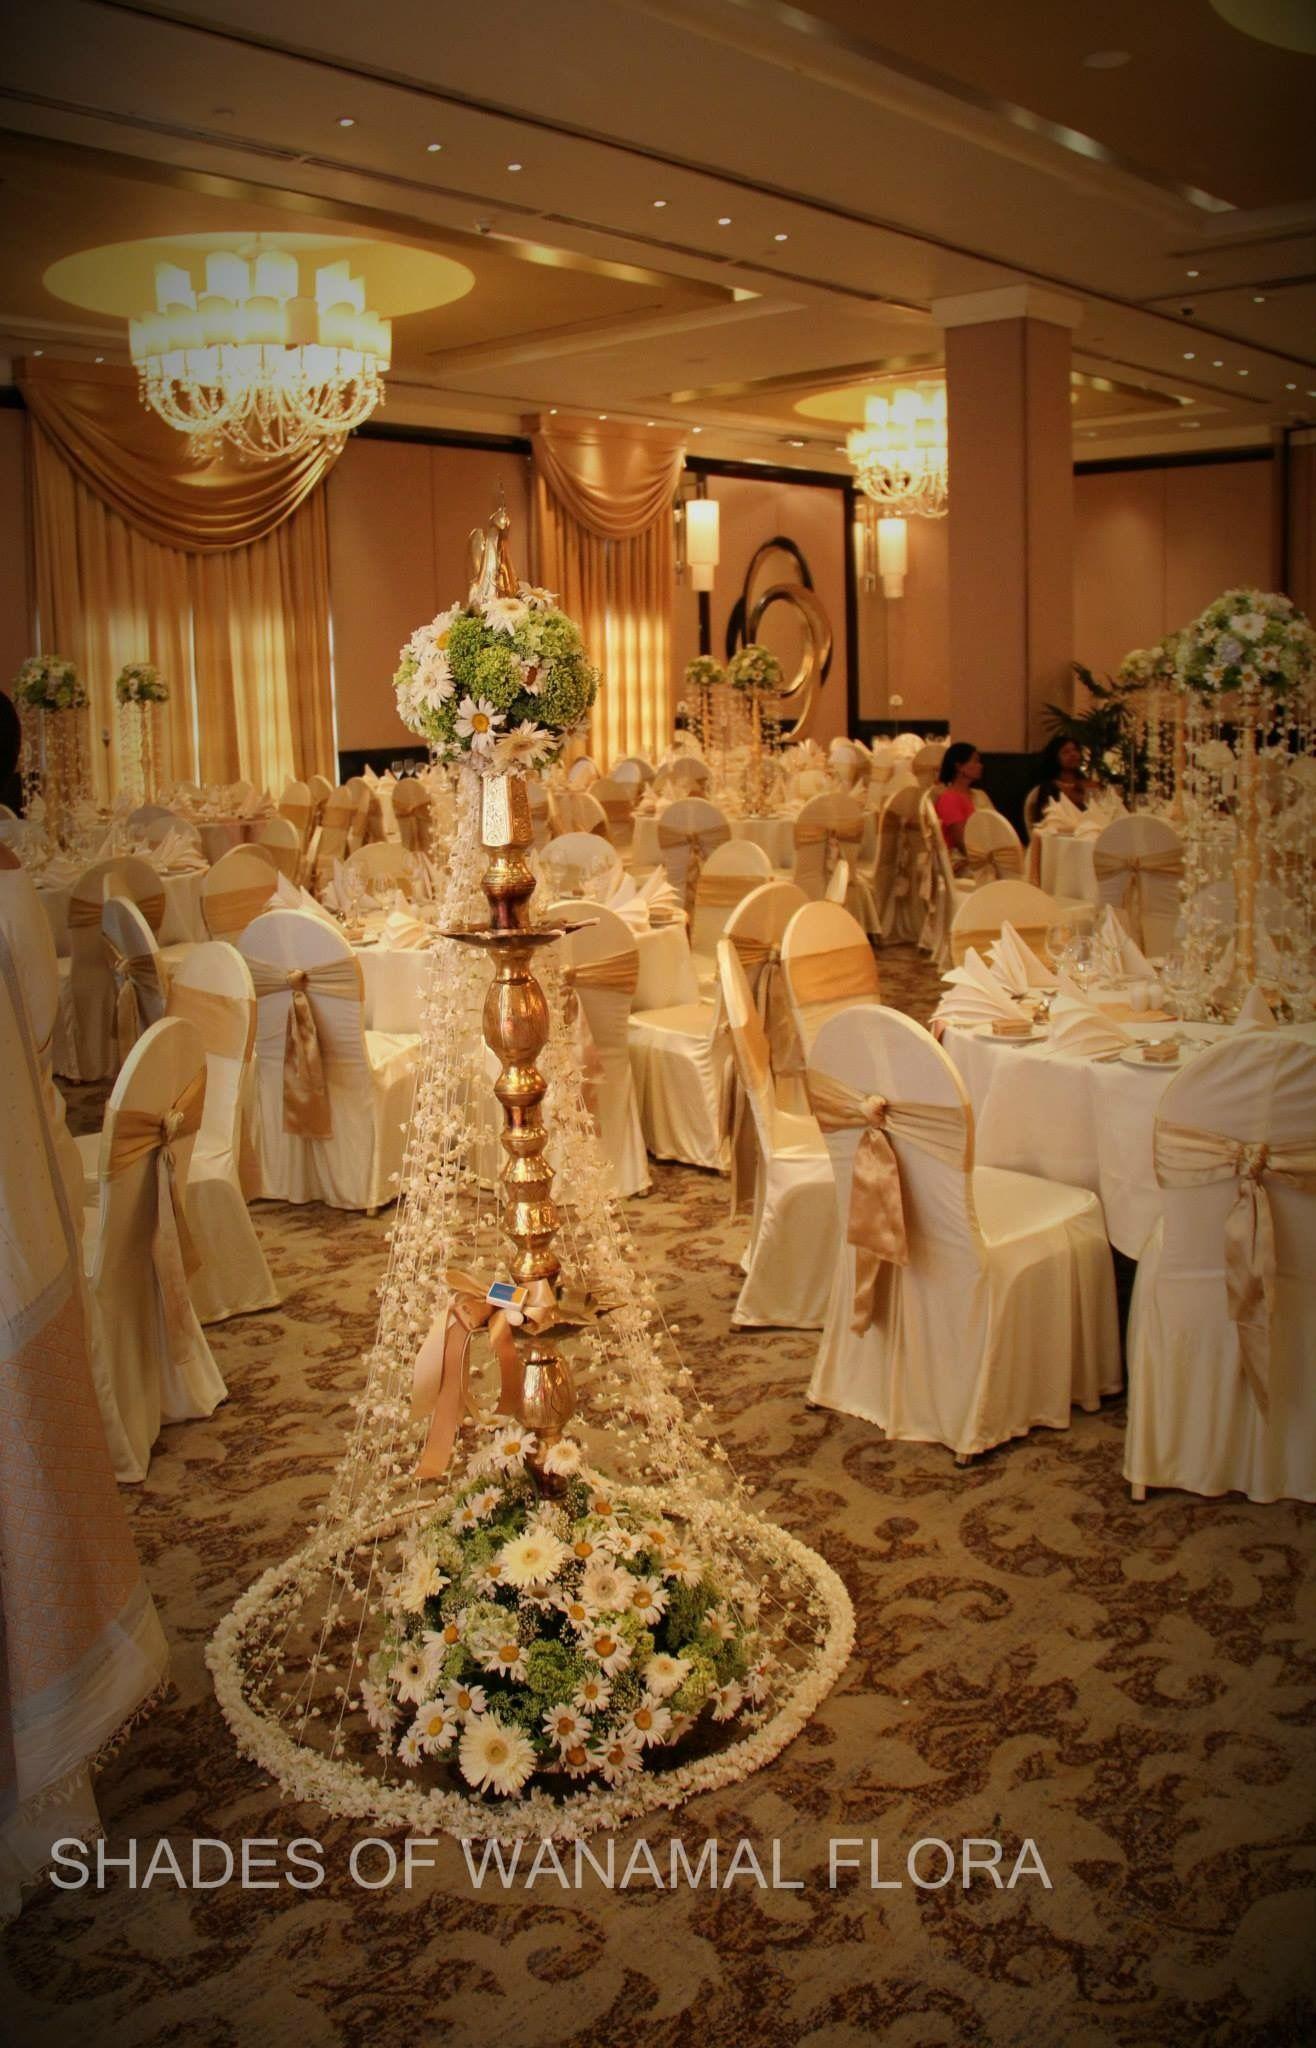 Wanamal table lamp decor wedding decor pinterest wedding wanamal table lamp decor geotapseo Gallery